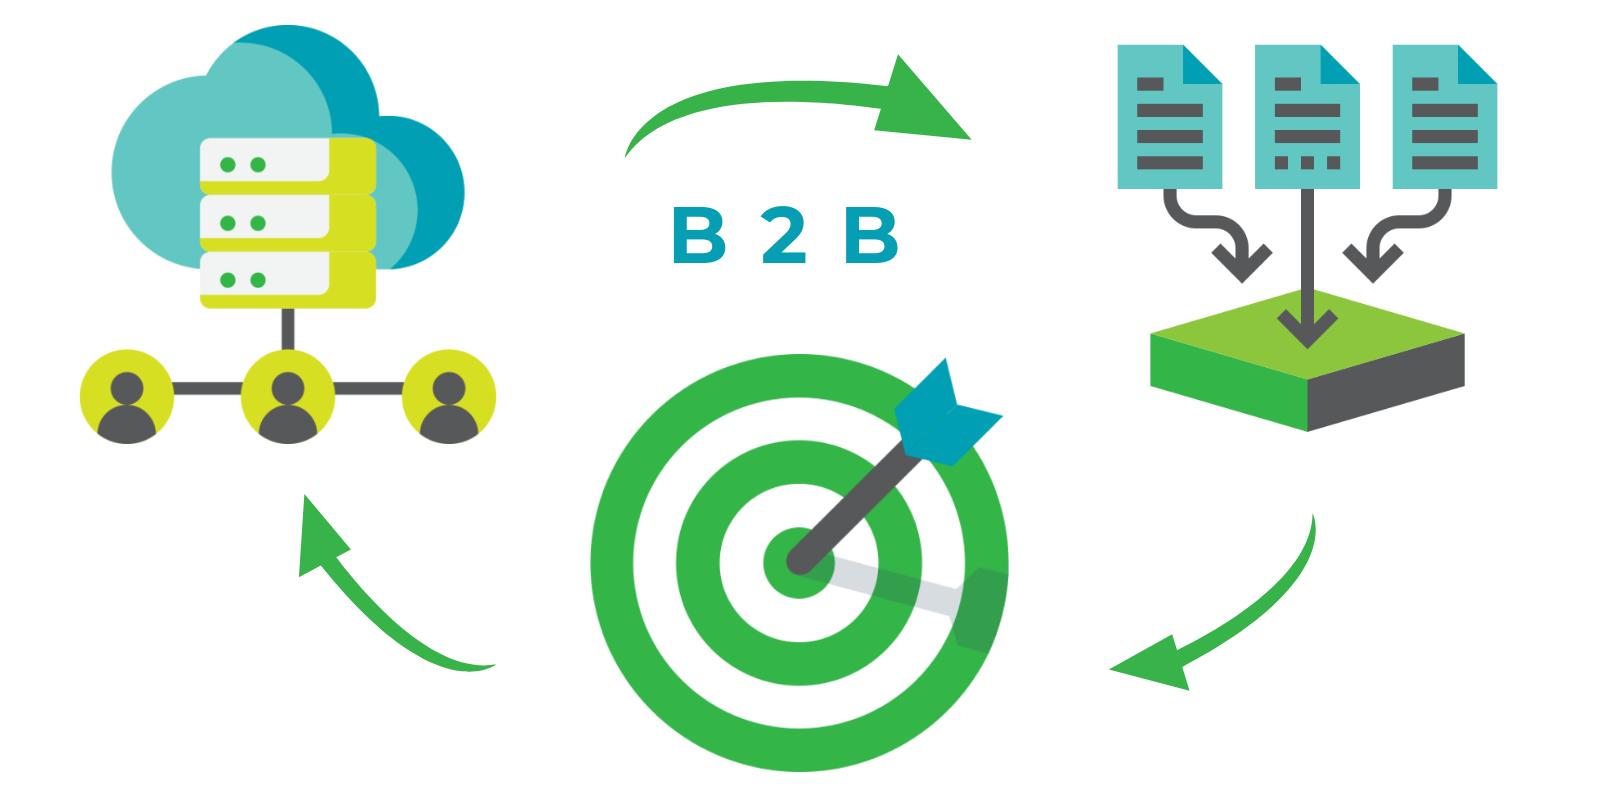 Integrirani B2B eCommerce sustav Hecta